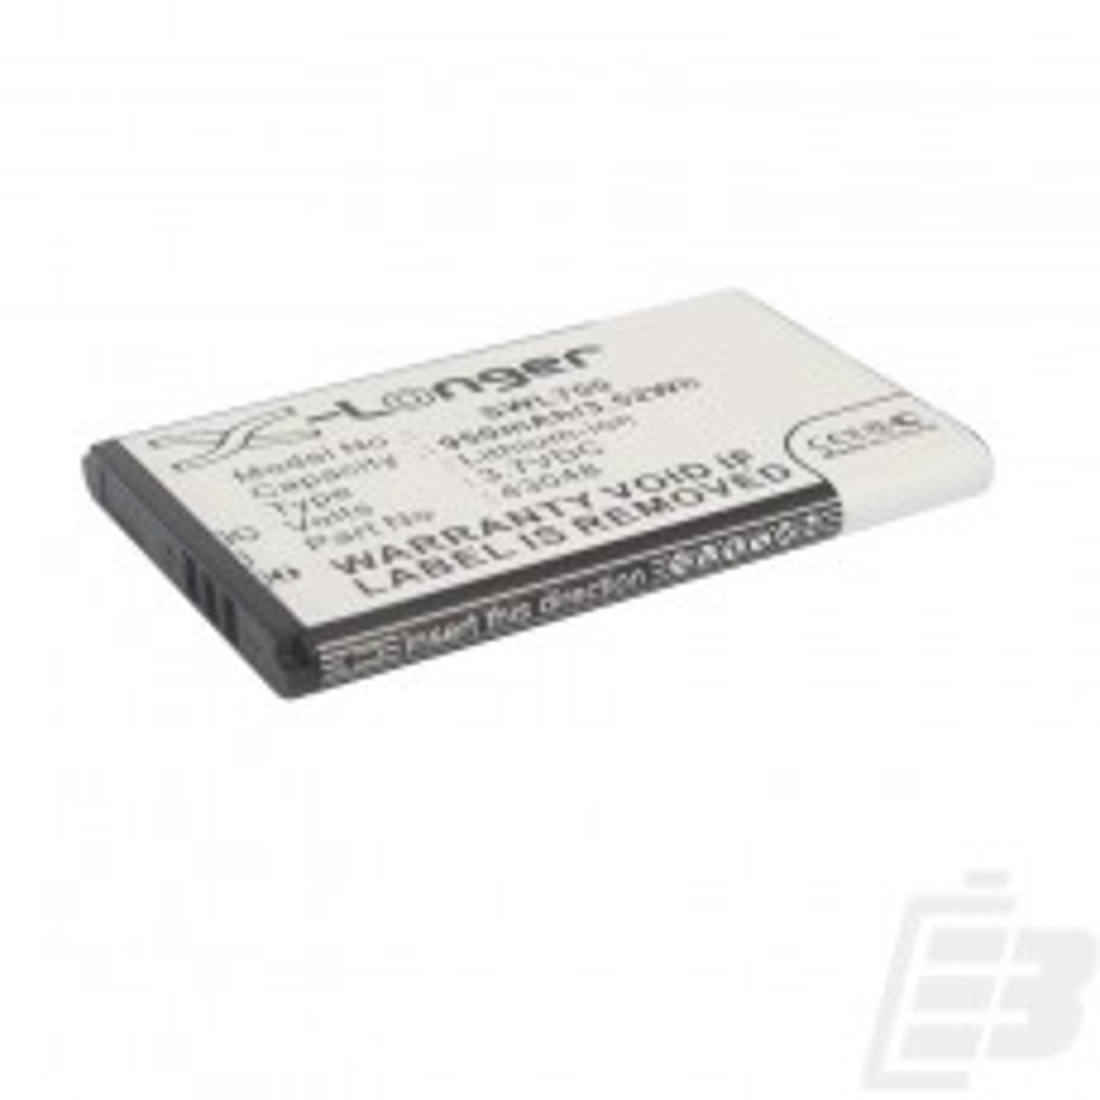 Cordless phone battery SwissVoice L7_1